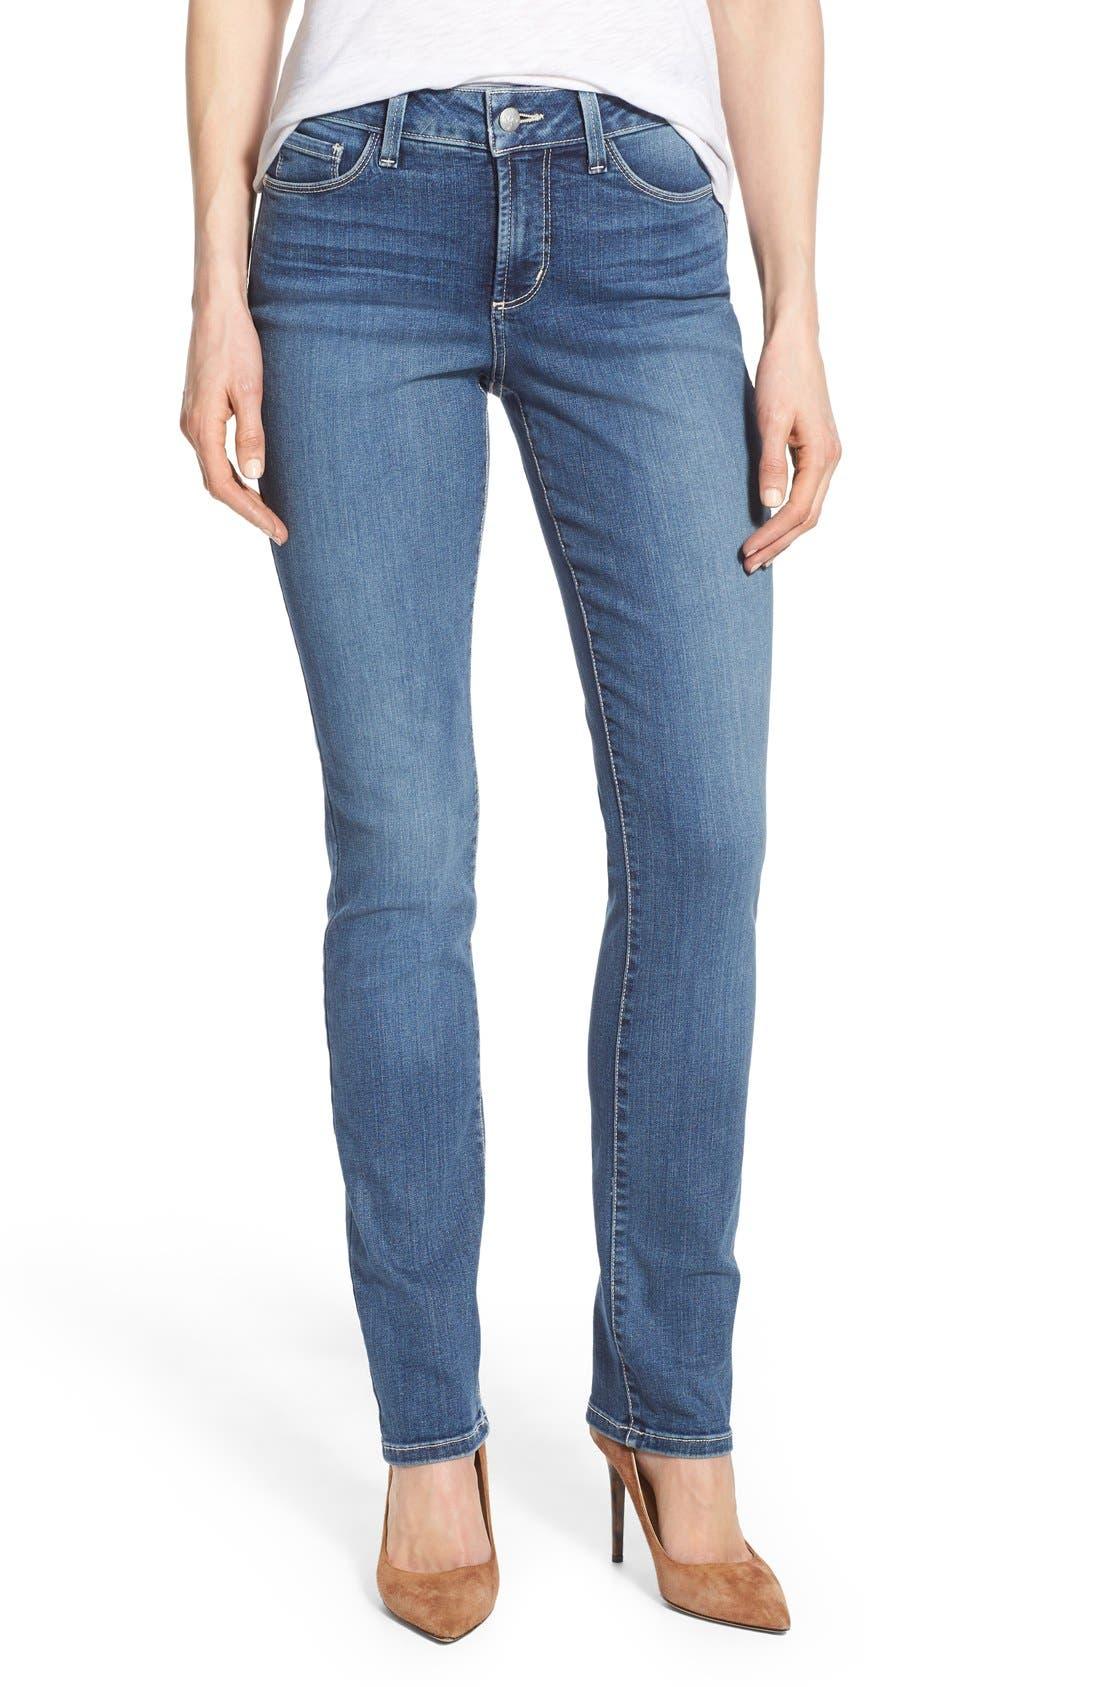 Alternate Image 1 Selected - NYDJ 'Samantha' Stretch Slim Straight Leg Jeans (Heyburn) (Regular & Petite)